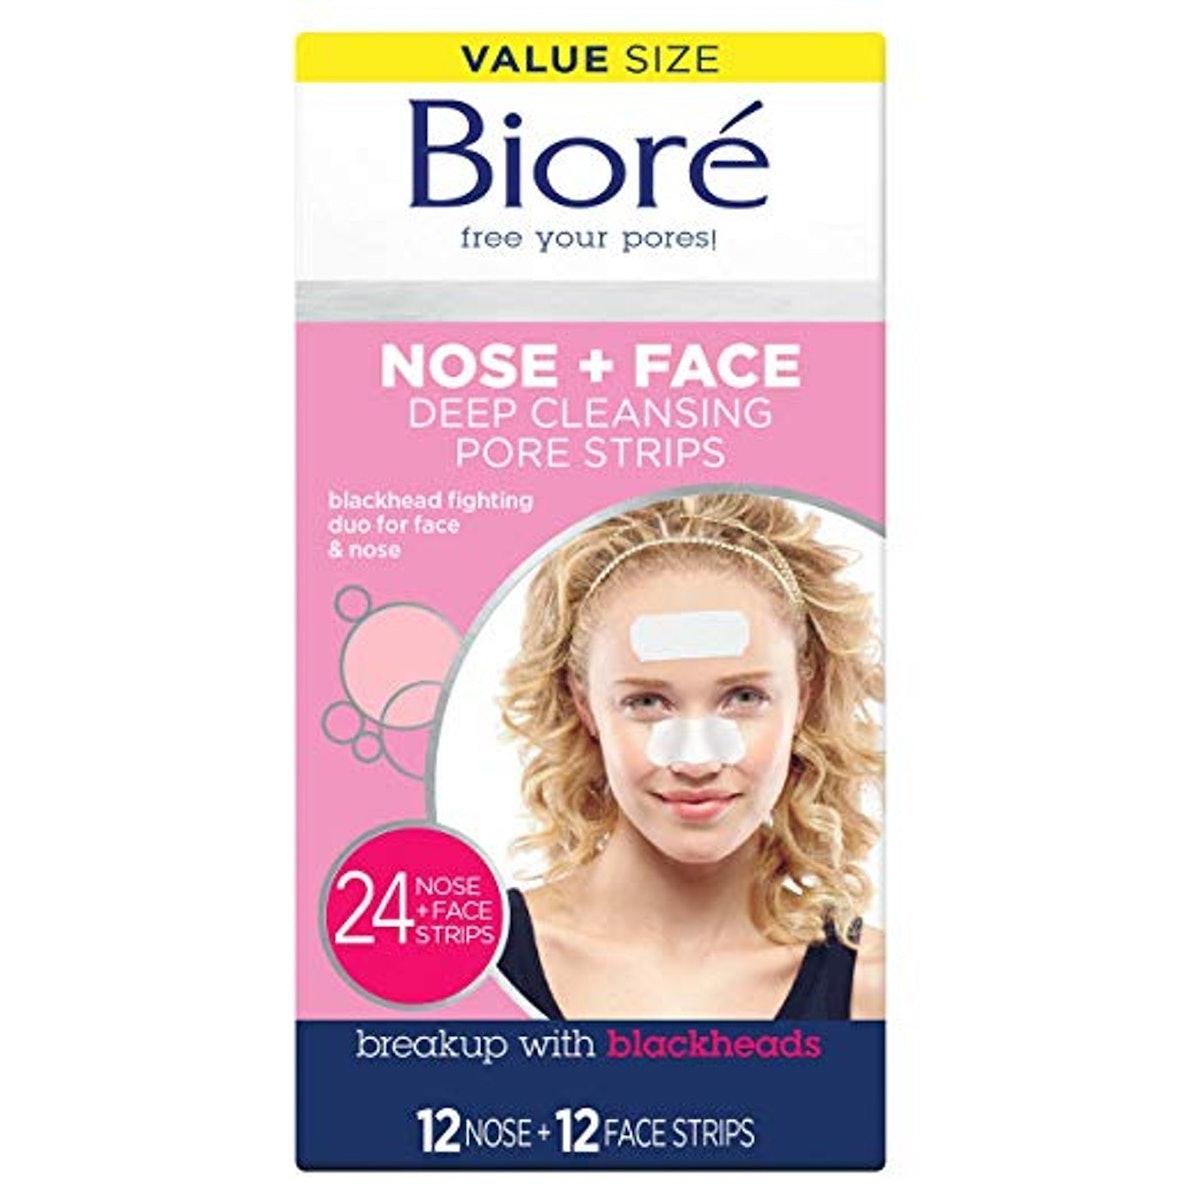 Bioré Nose + Face Deep Cleansing Pore Strips (24-Pack)